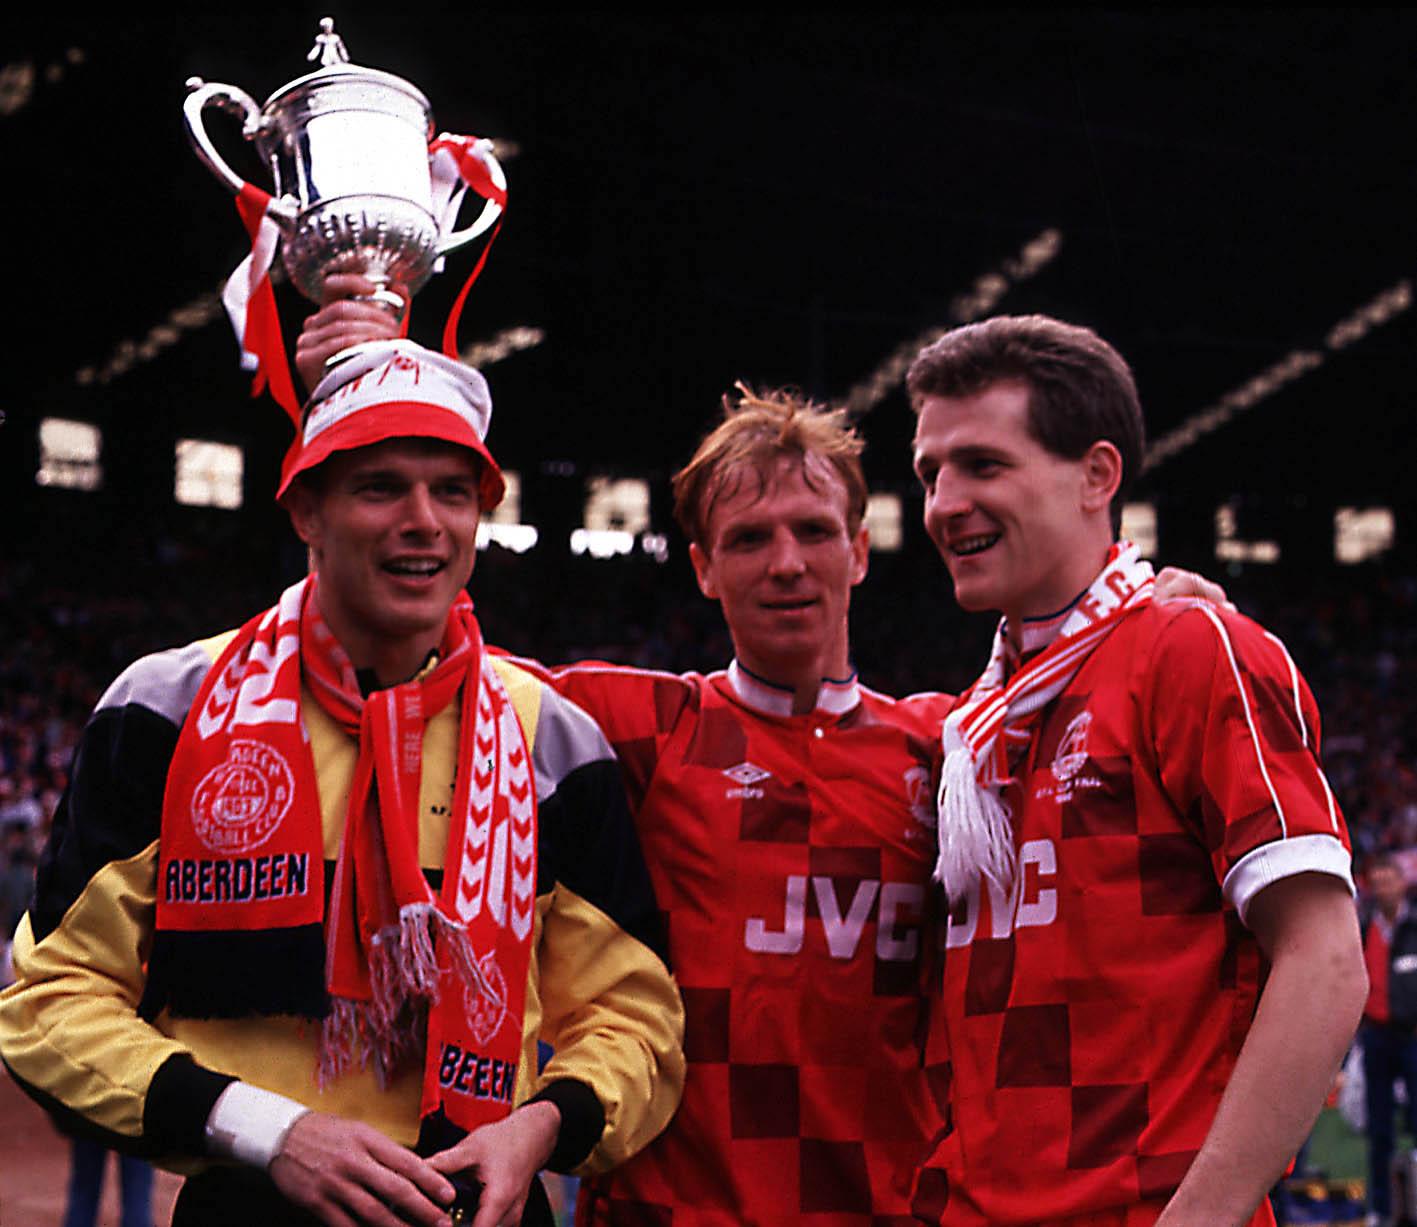 Aberdeen trio Theo Snelders, left, Alex McLeish, centre, and Brian Irvine celebrate the win in 1990.